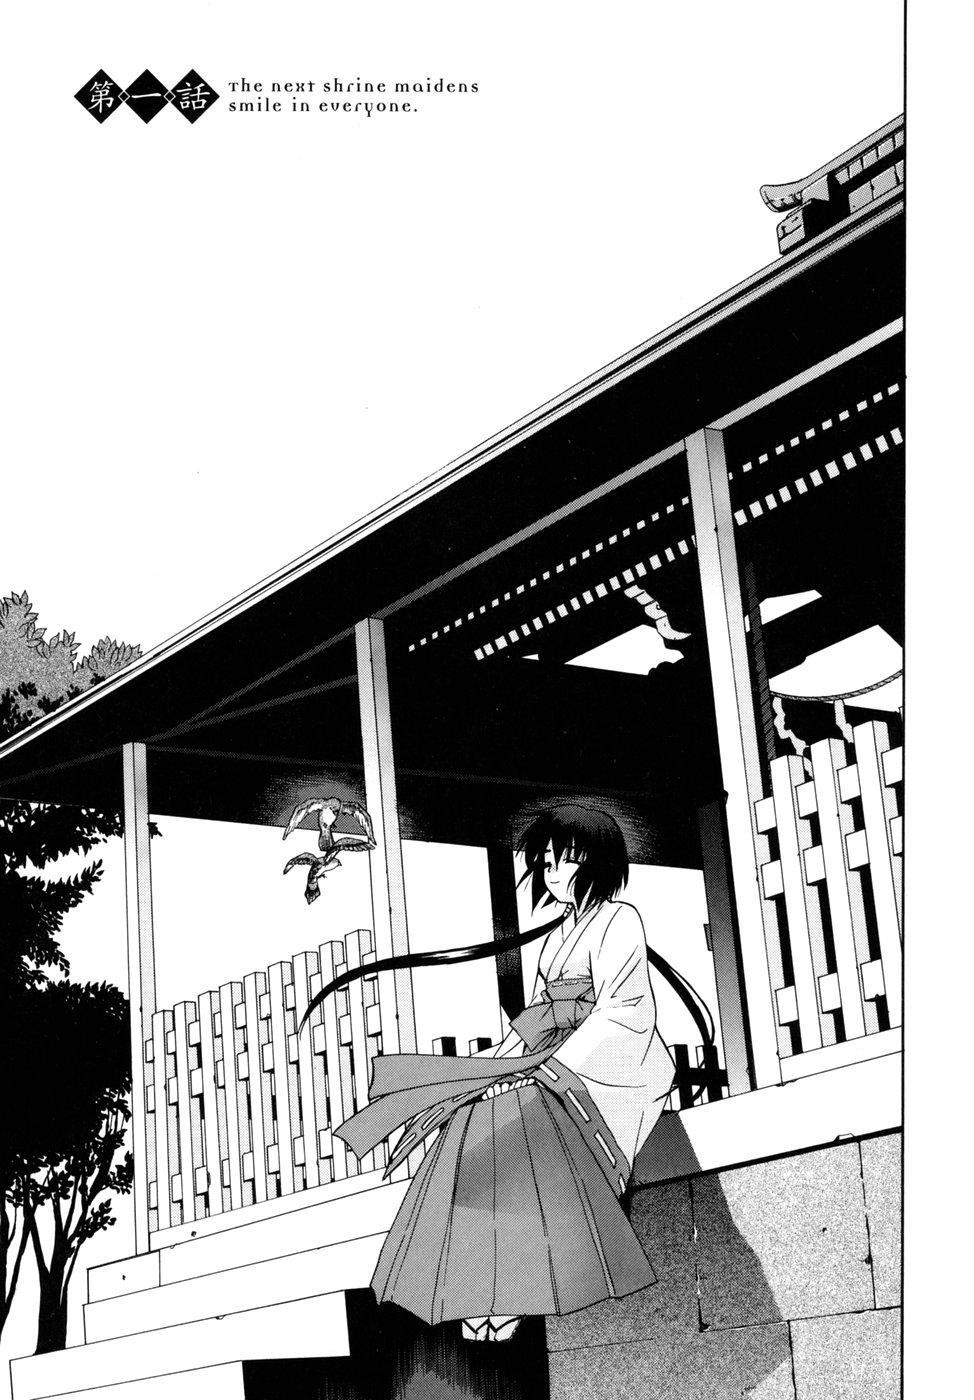 [Yaya Hinata] Tonari no Miko-san wa Minna Warau - The next shrine maidens smile in everyone. 6